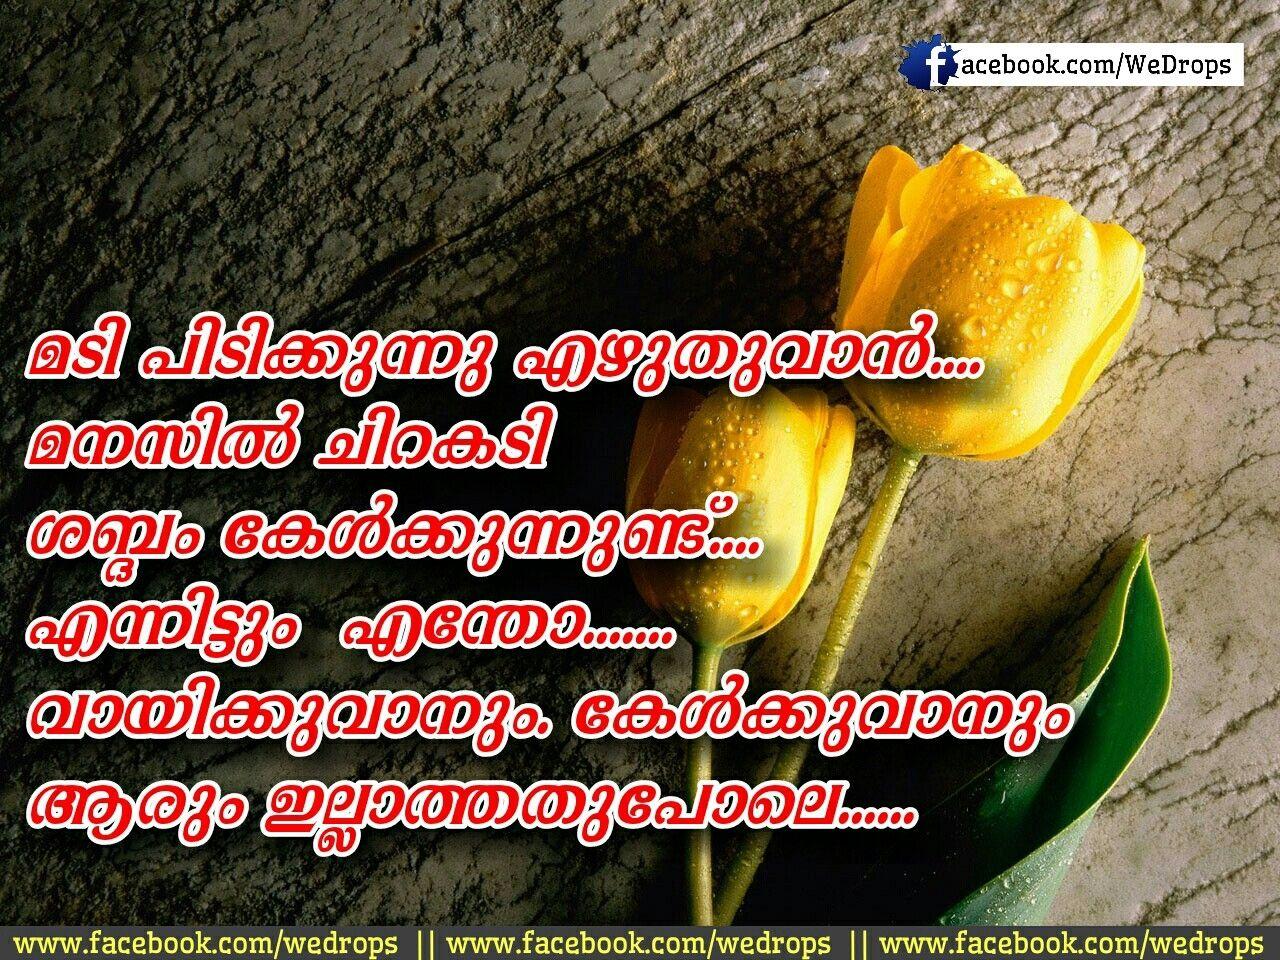 Hd Images Of Love Quotes Malayalam Malayalam Love S S Malayalam S Smalayalam Quotes Pertaining To Images Of Love Quotes Malayalam